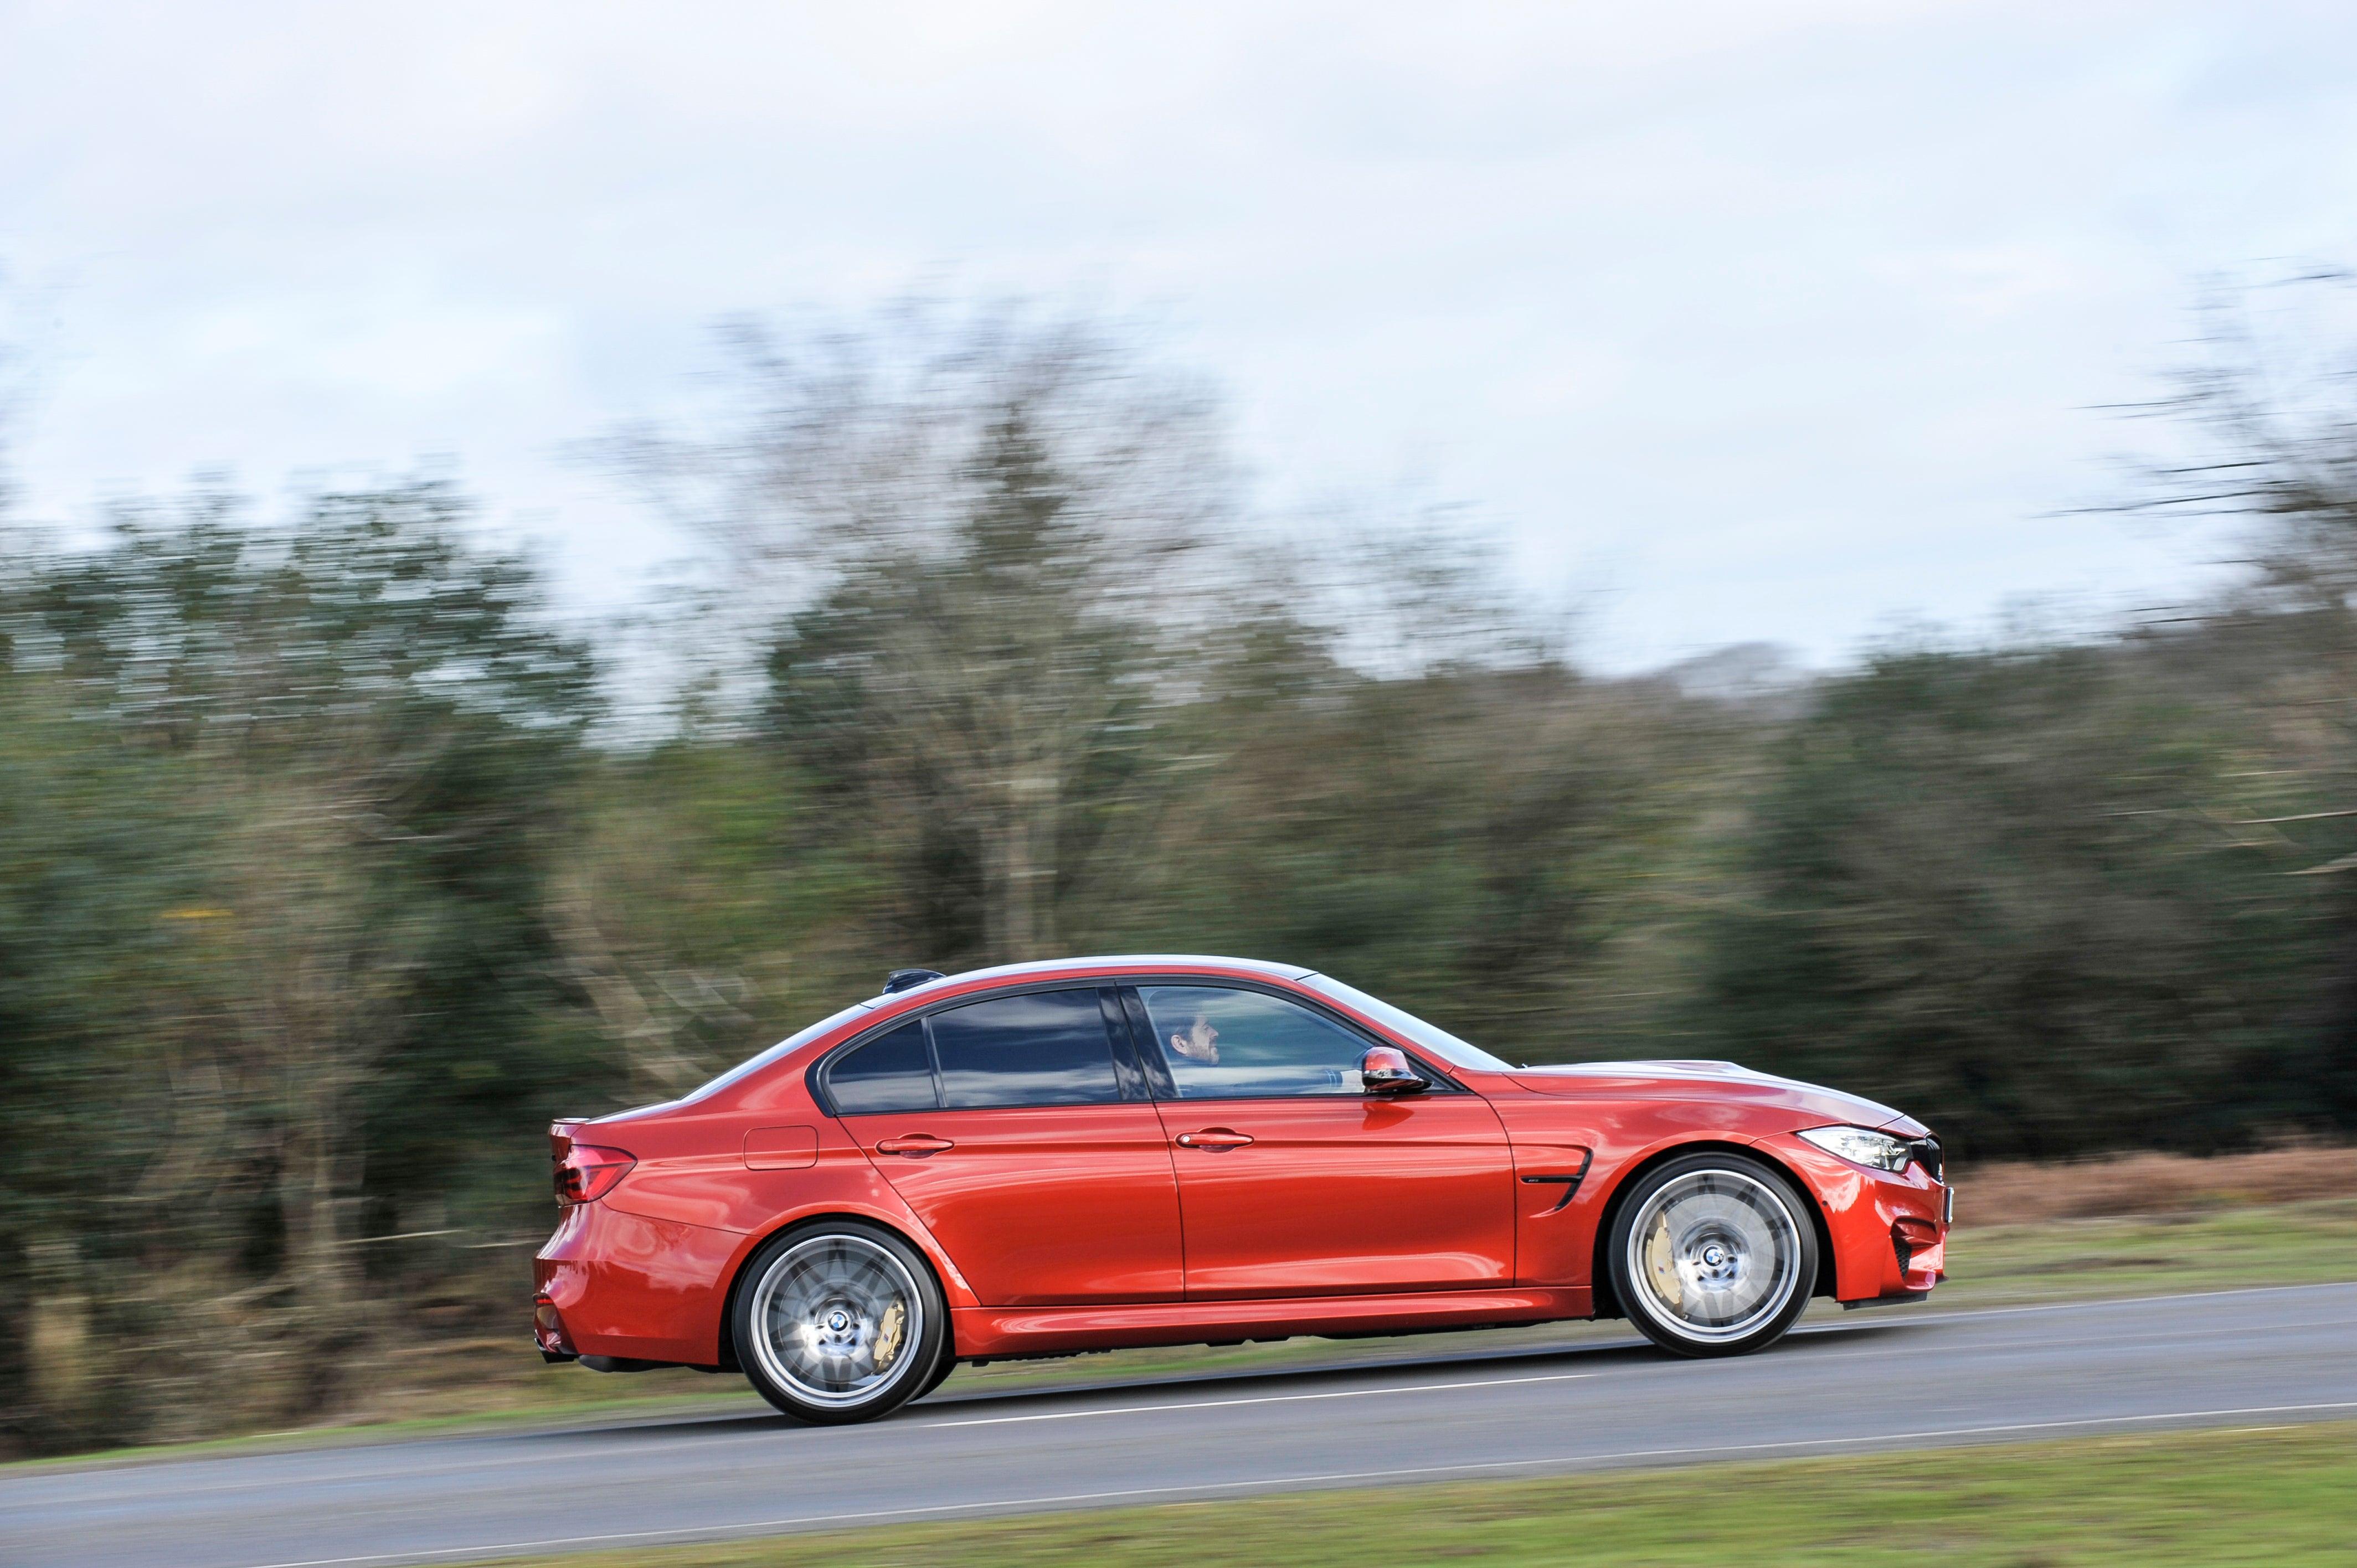 BMW M3 Driving Side